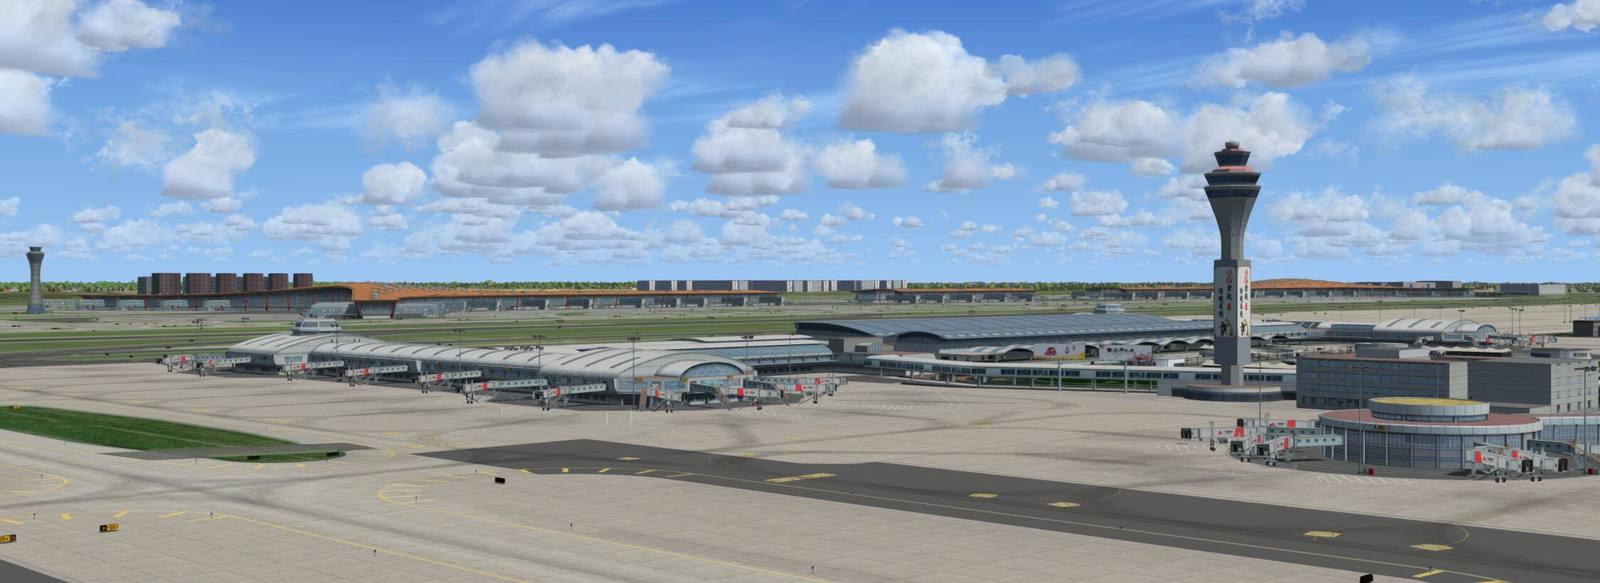 WF Scenery Studio Announce Beijing International Airport For